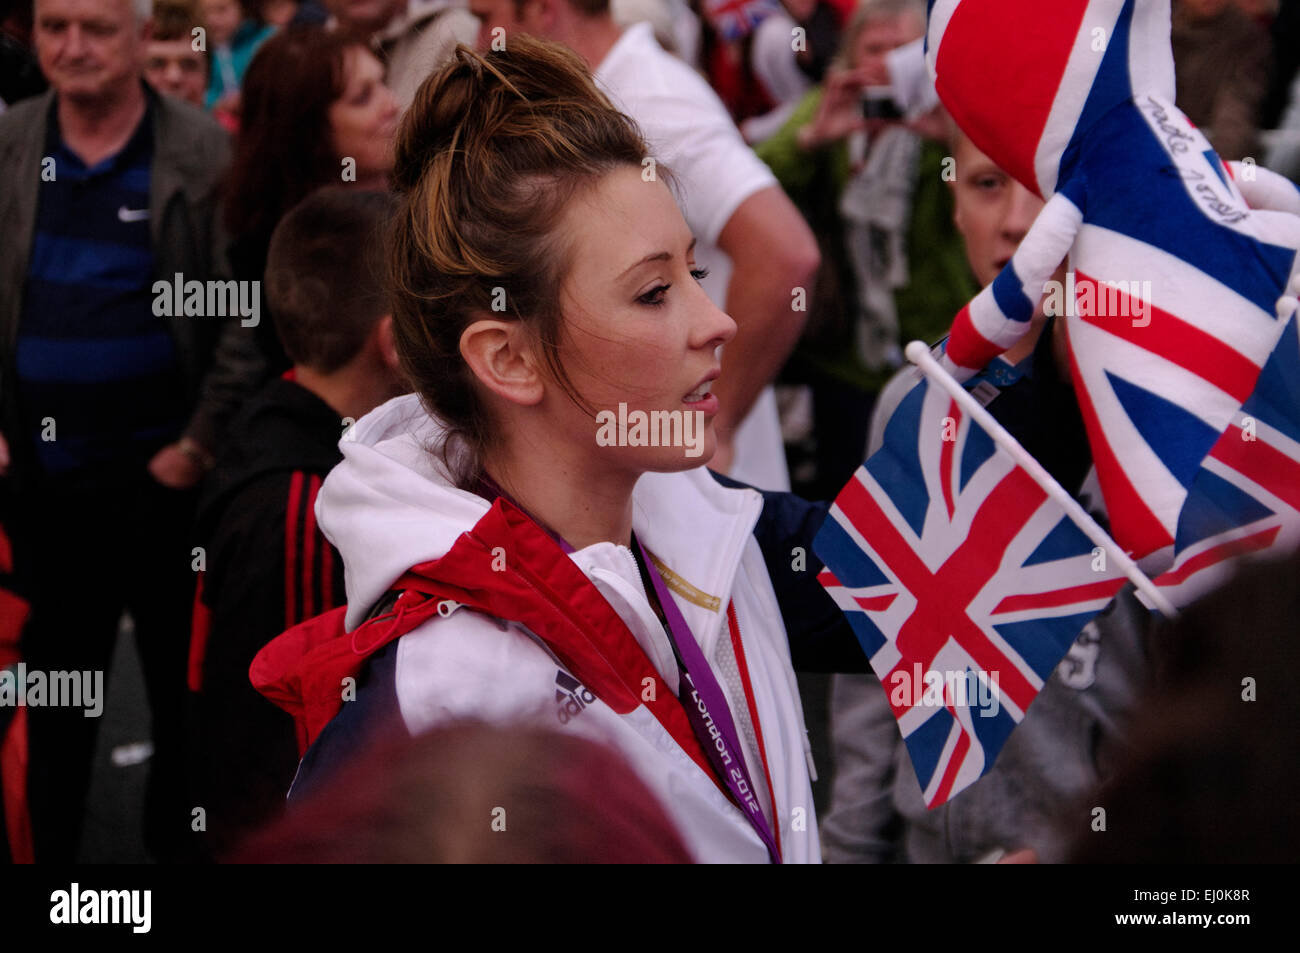 Jade Jones, athlète olympique, réception officielle, silex Photo Stock